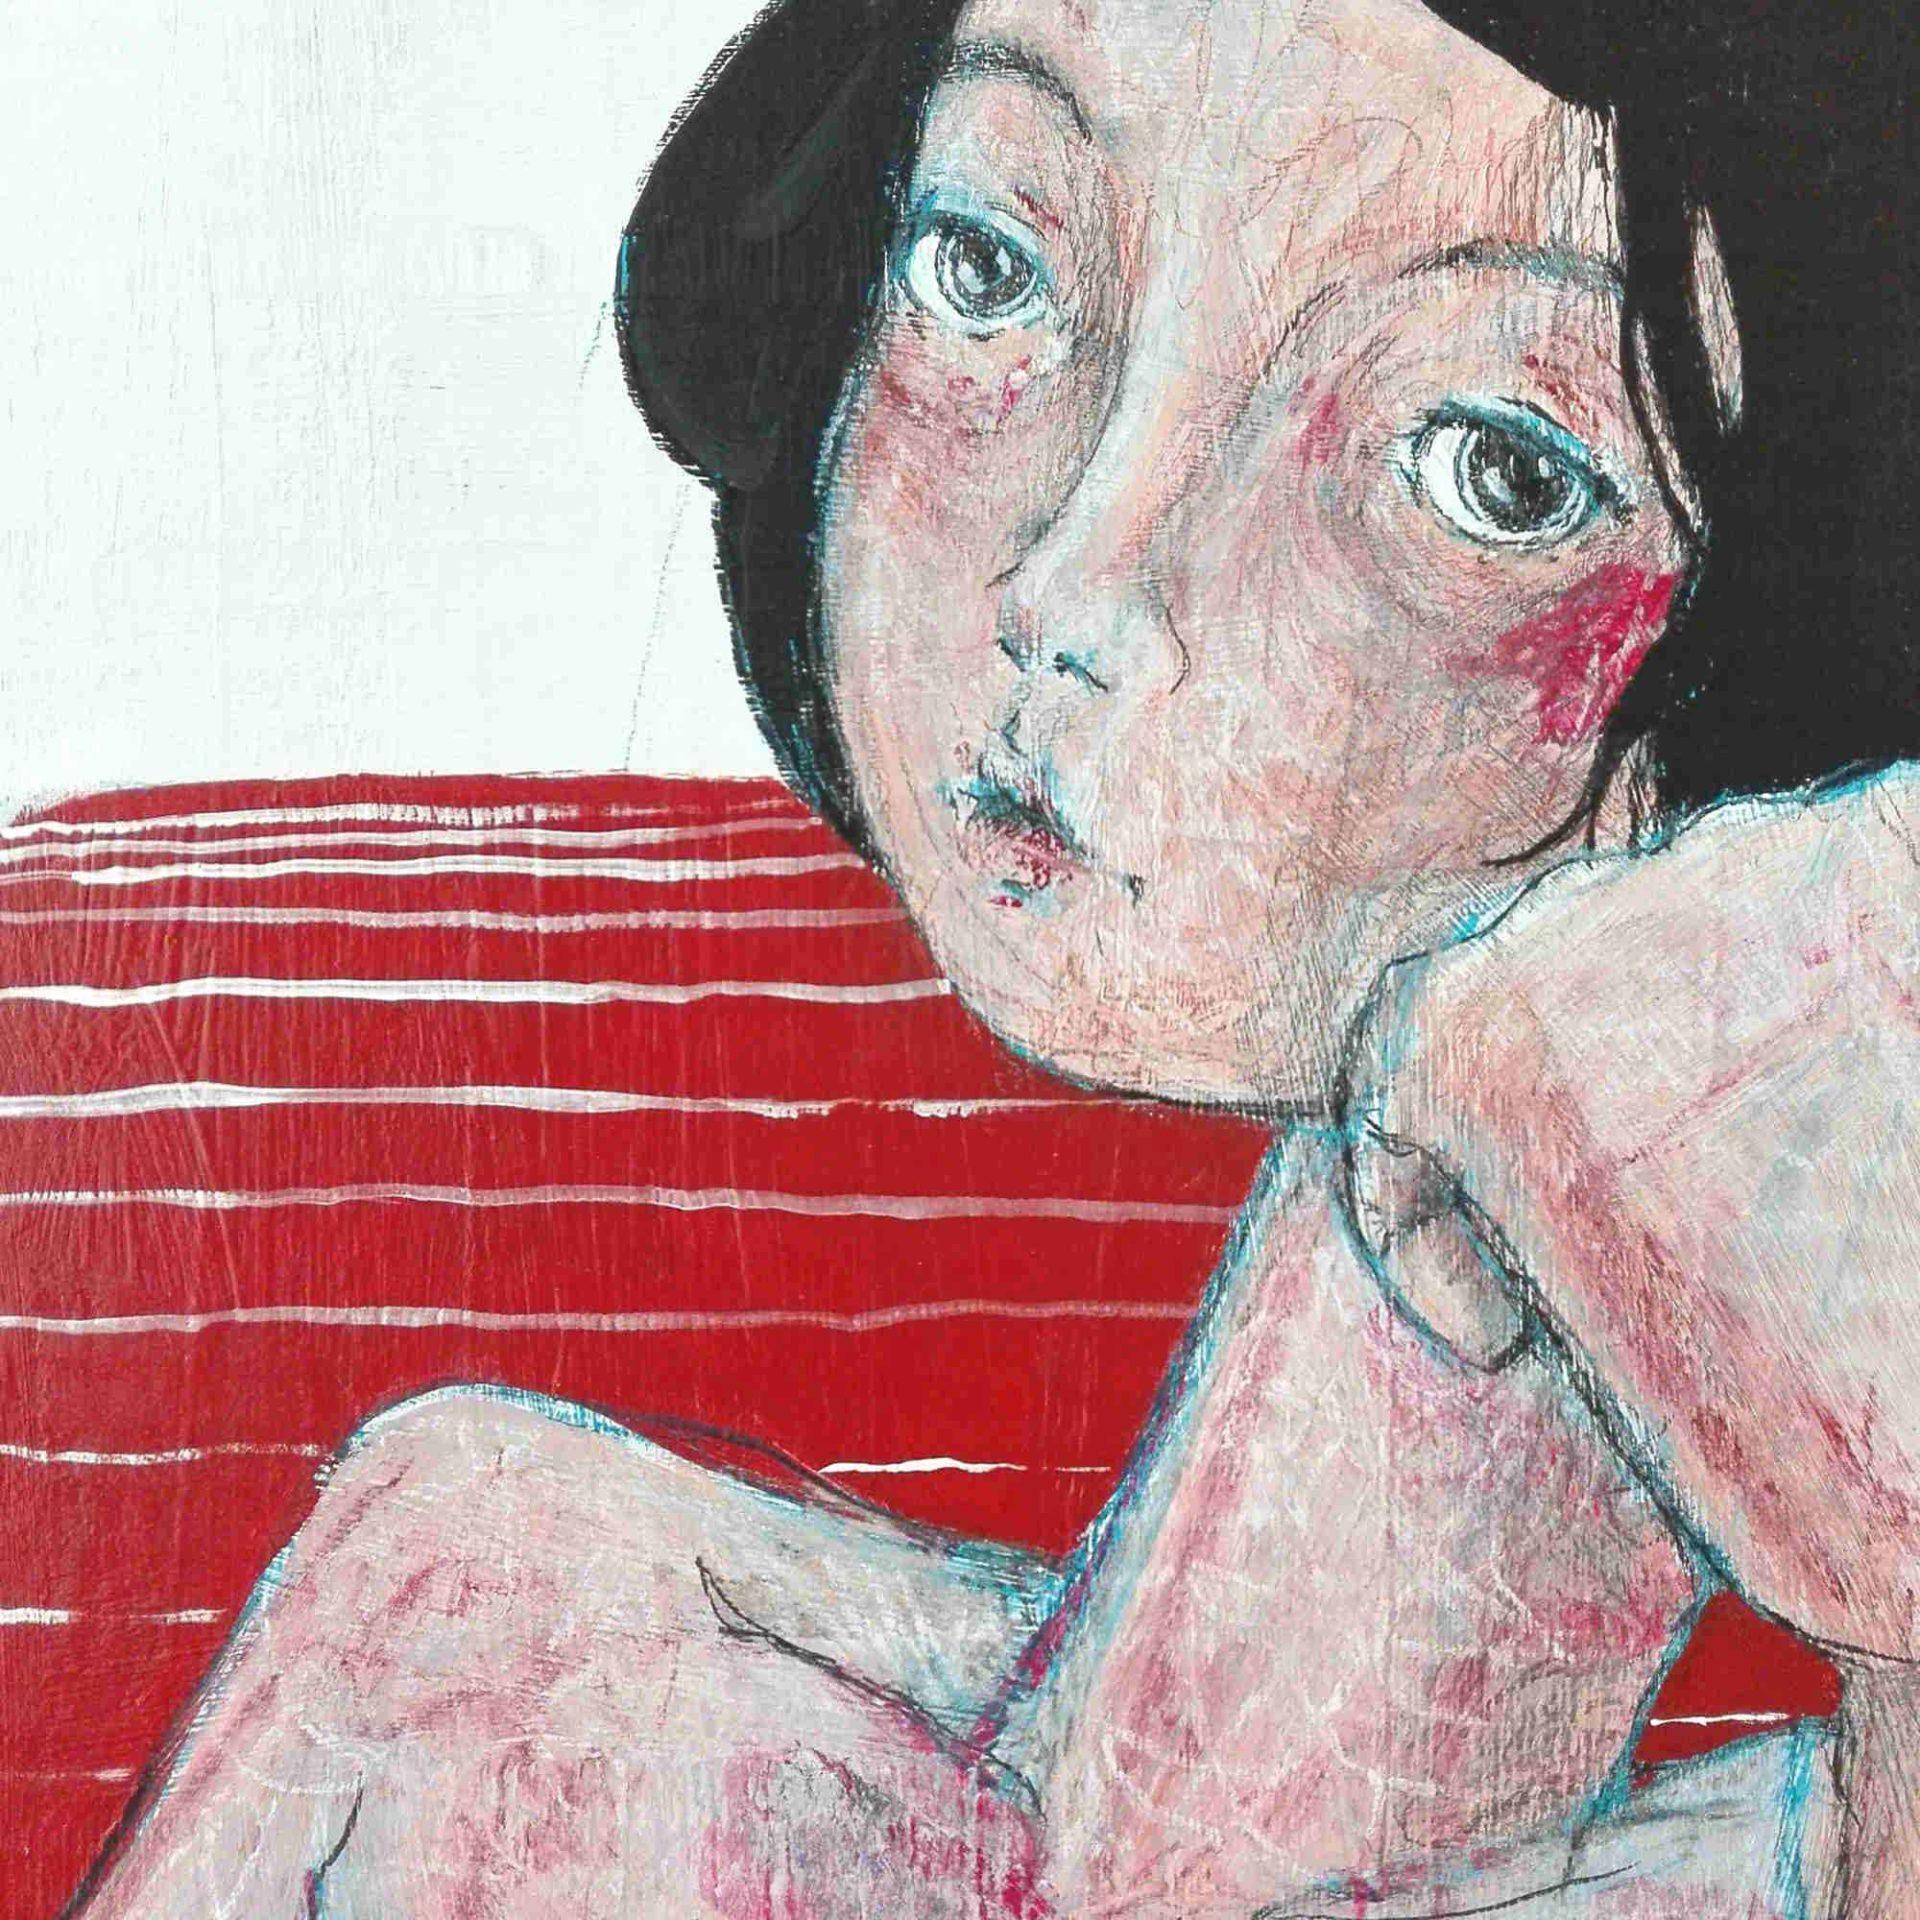 2015 Burnout Modella Pittura contemporanea Diego Gabriele